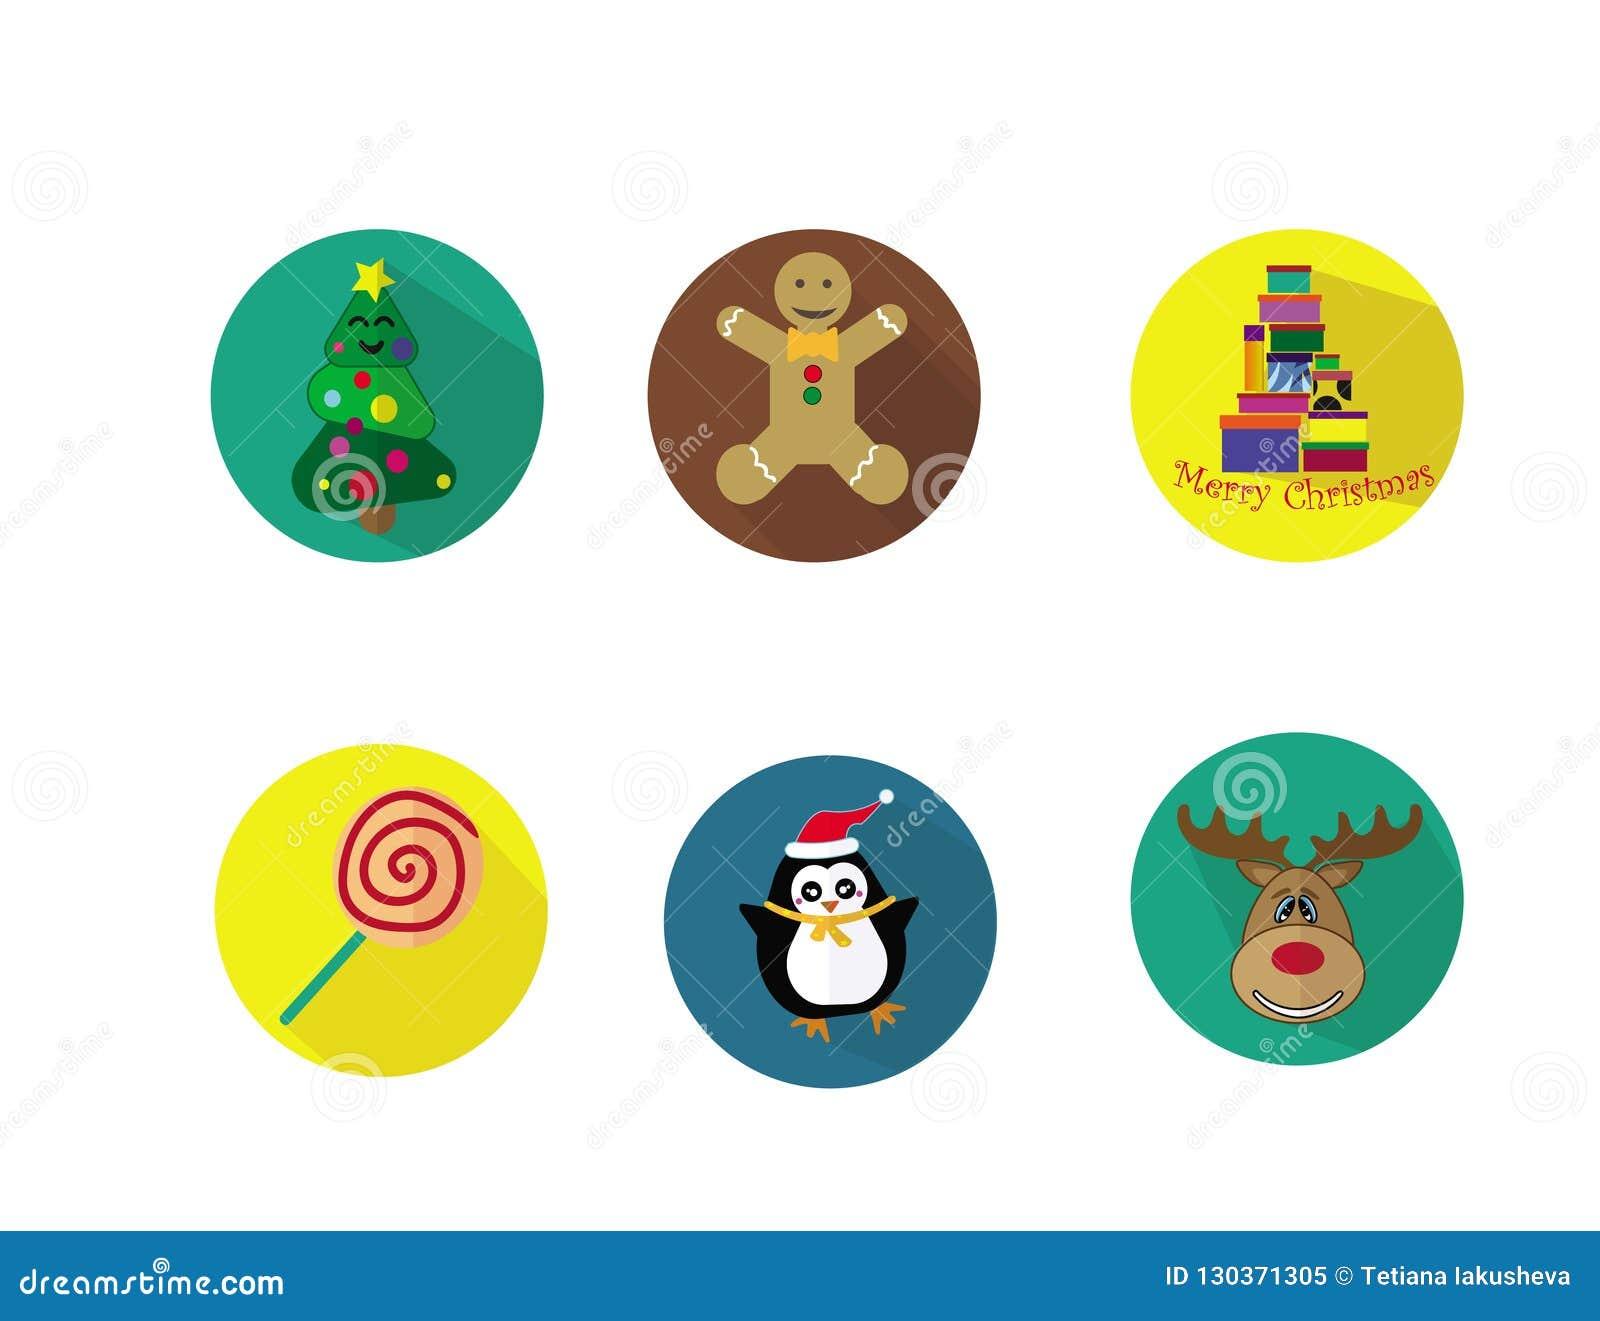 Christmas icons set. Colorful and funny.